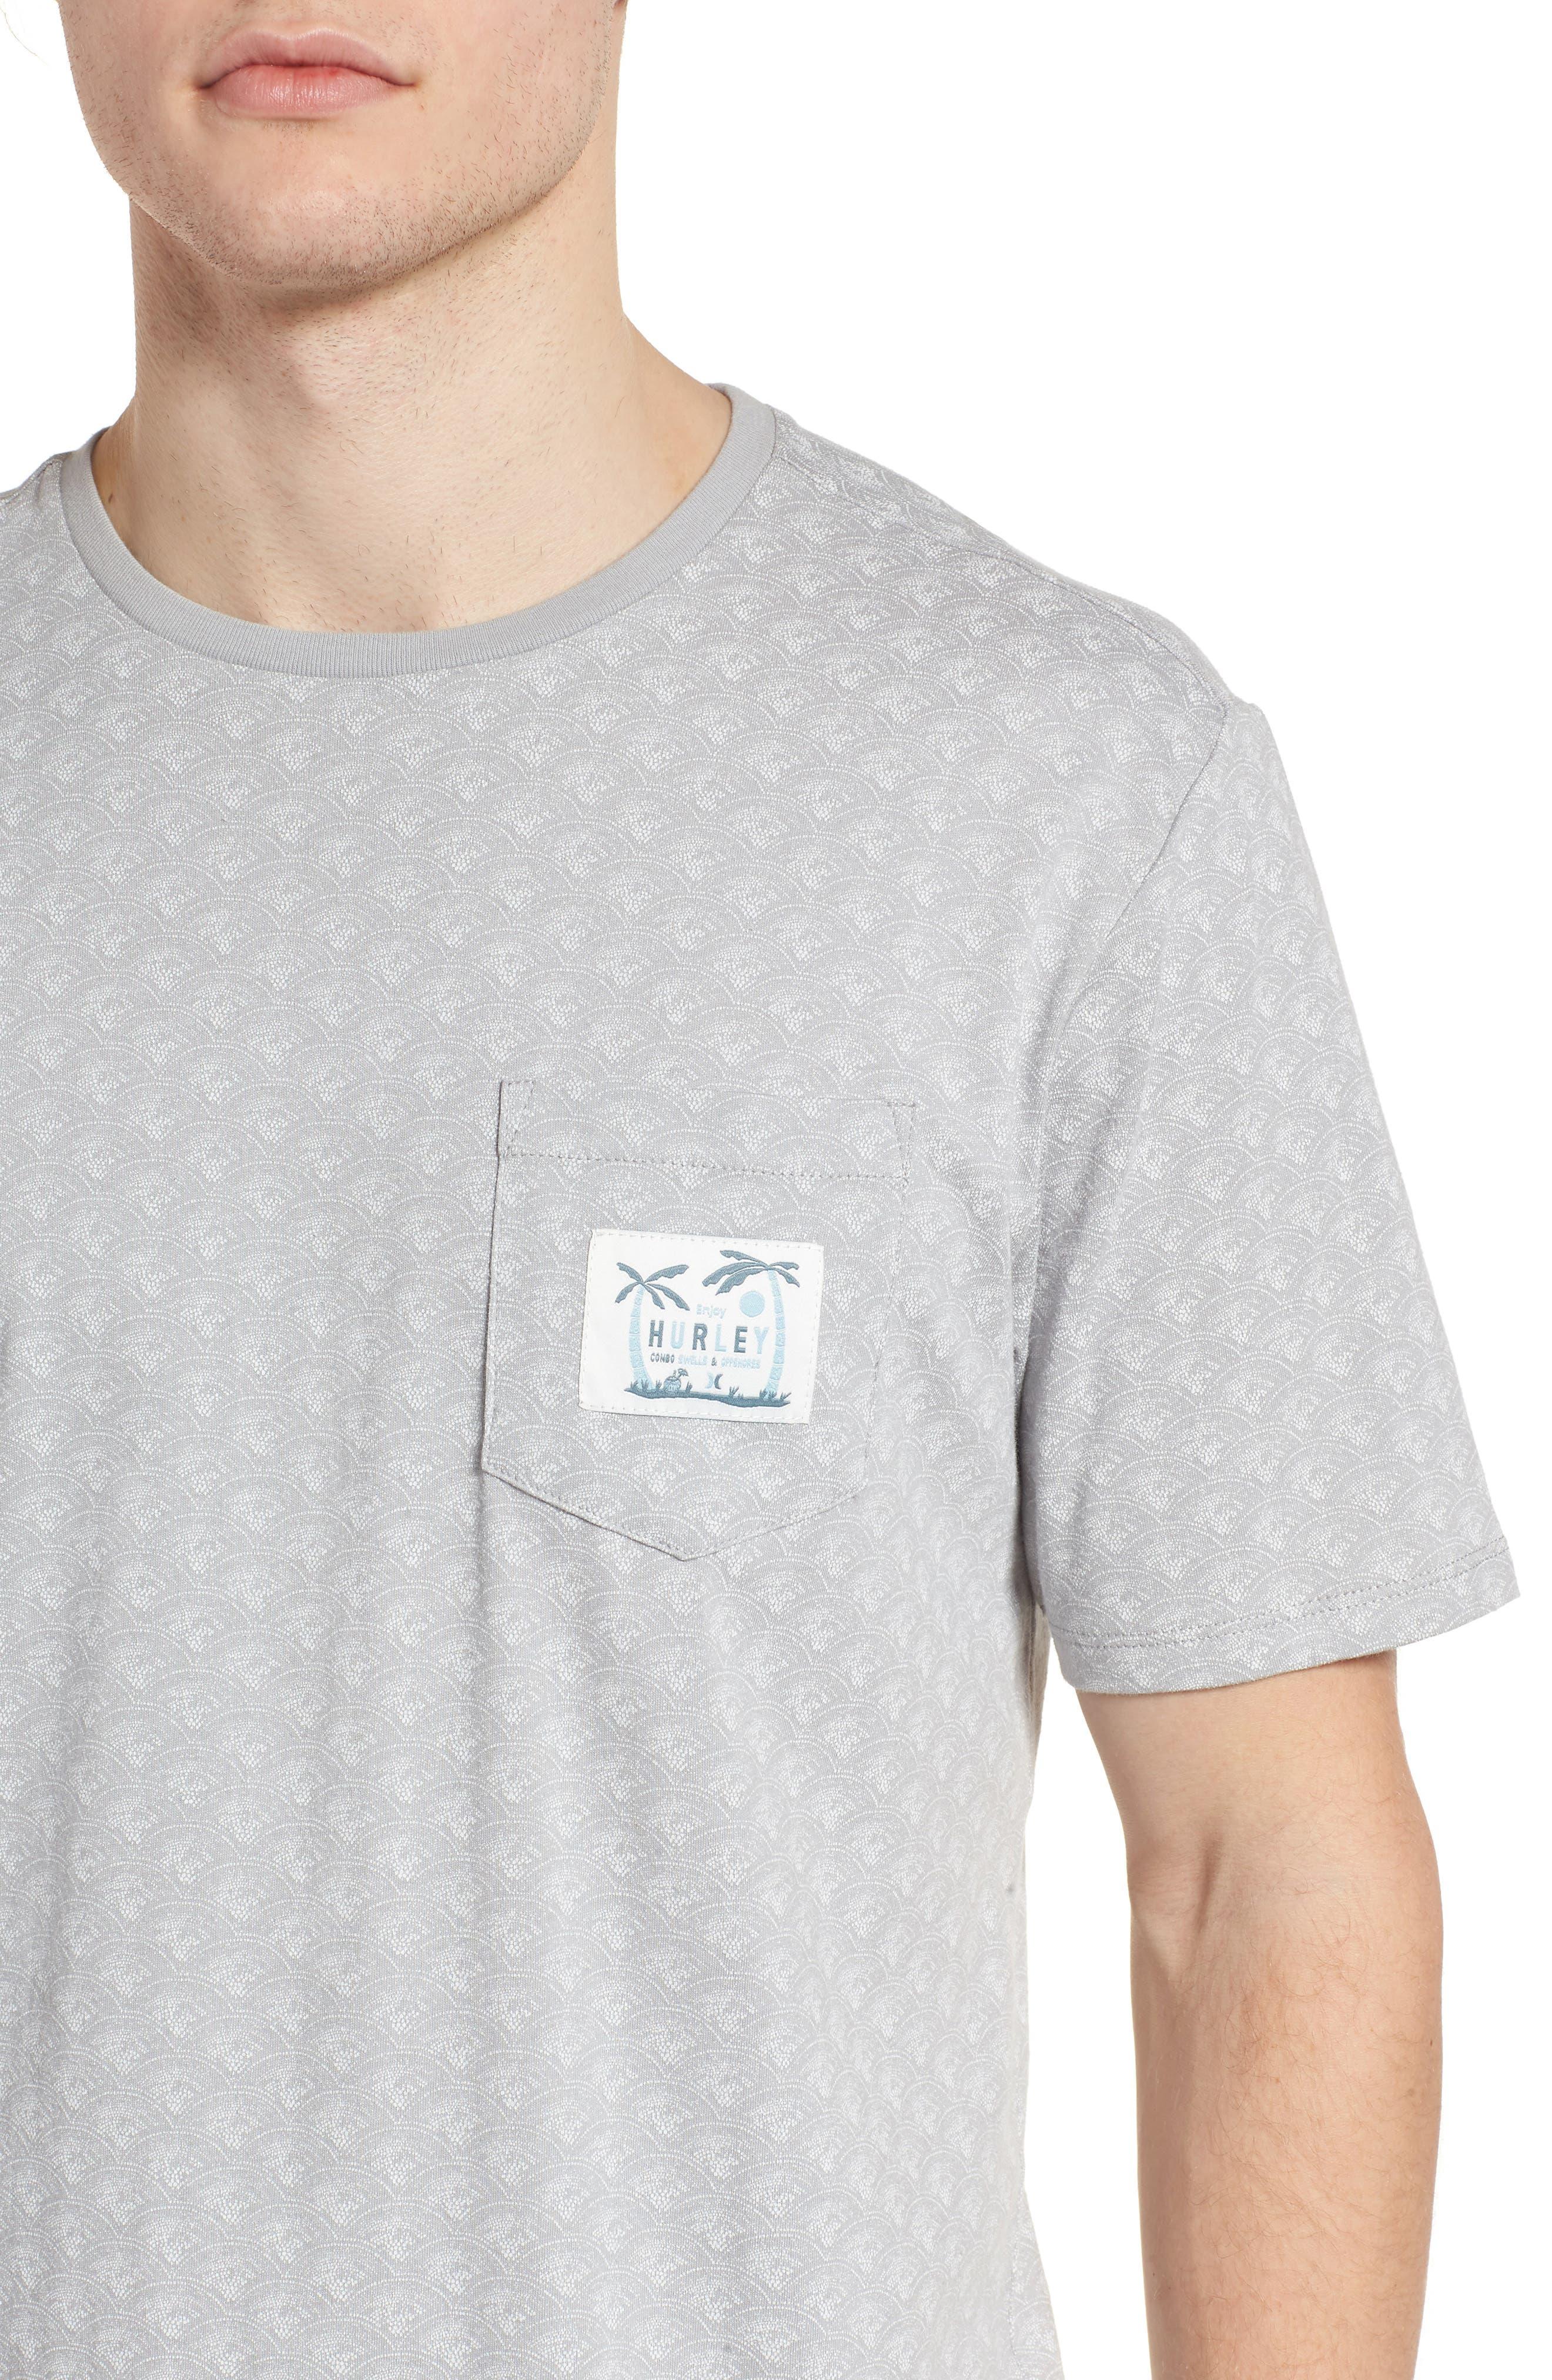 Pescado Short Sleeve T-Shirt,                             Alternate thumbnail 4, color,                             133